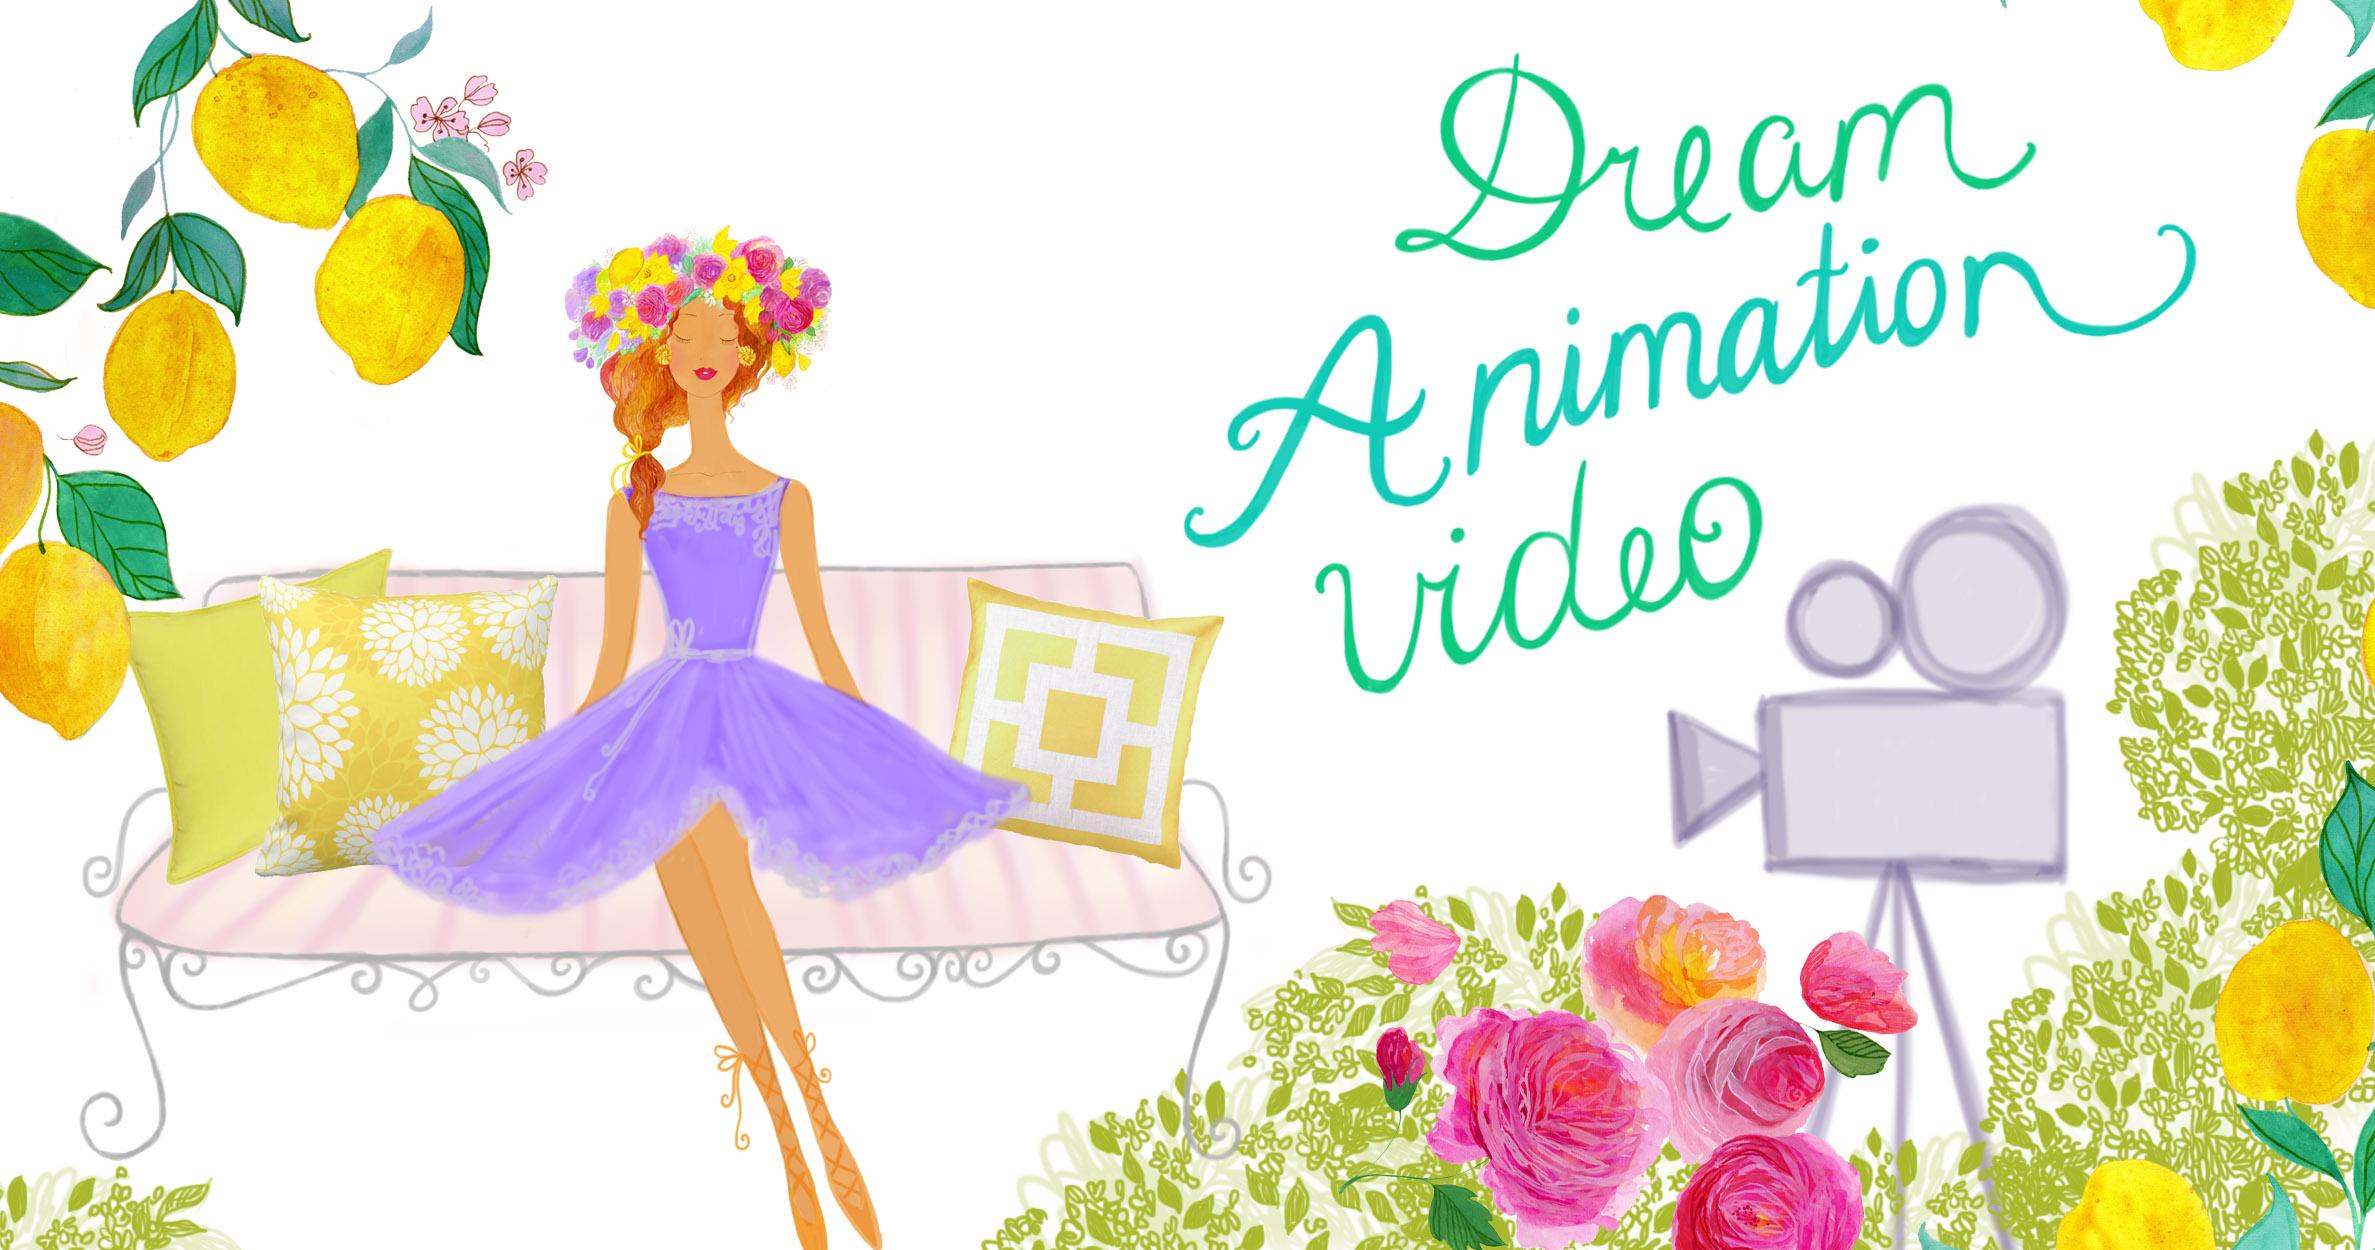 dream-30sec-video